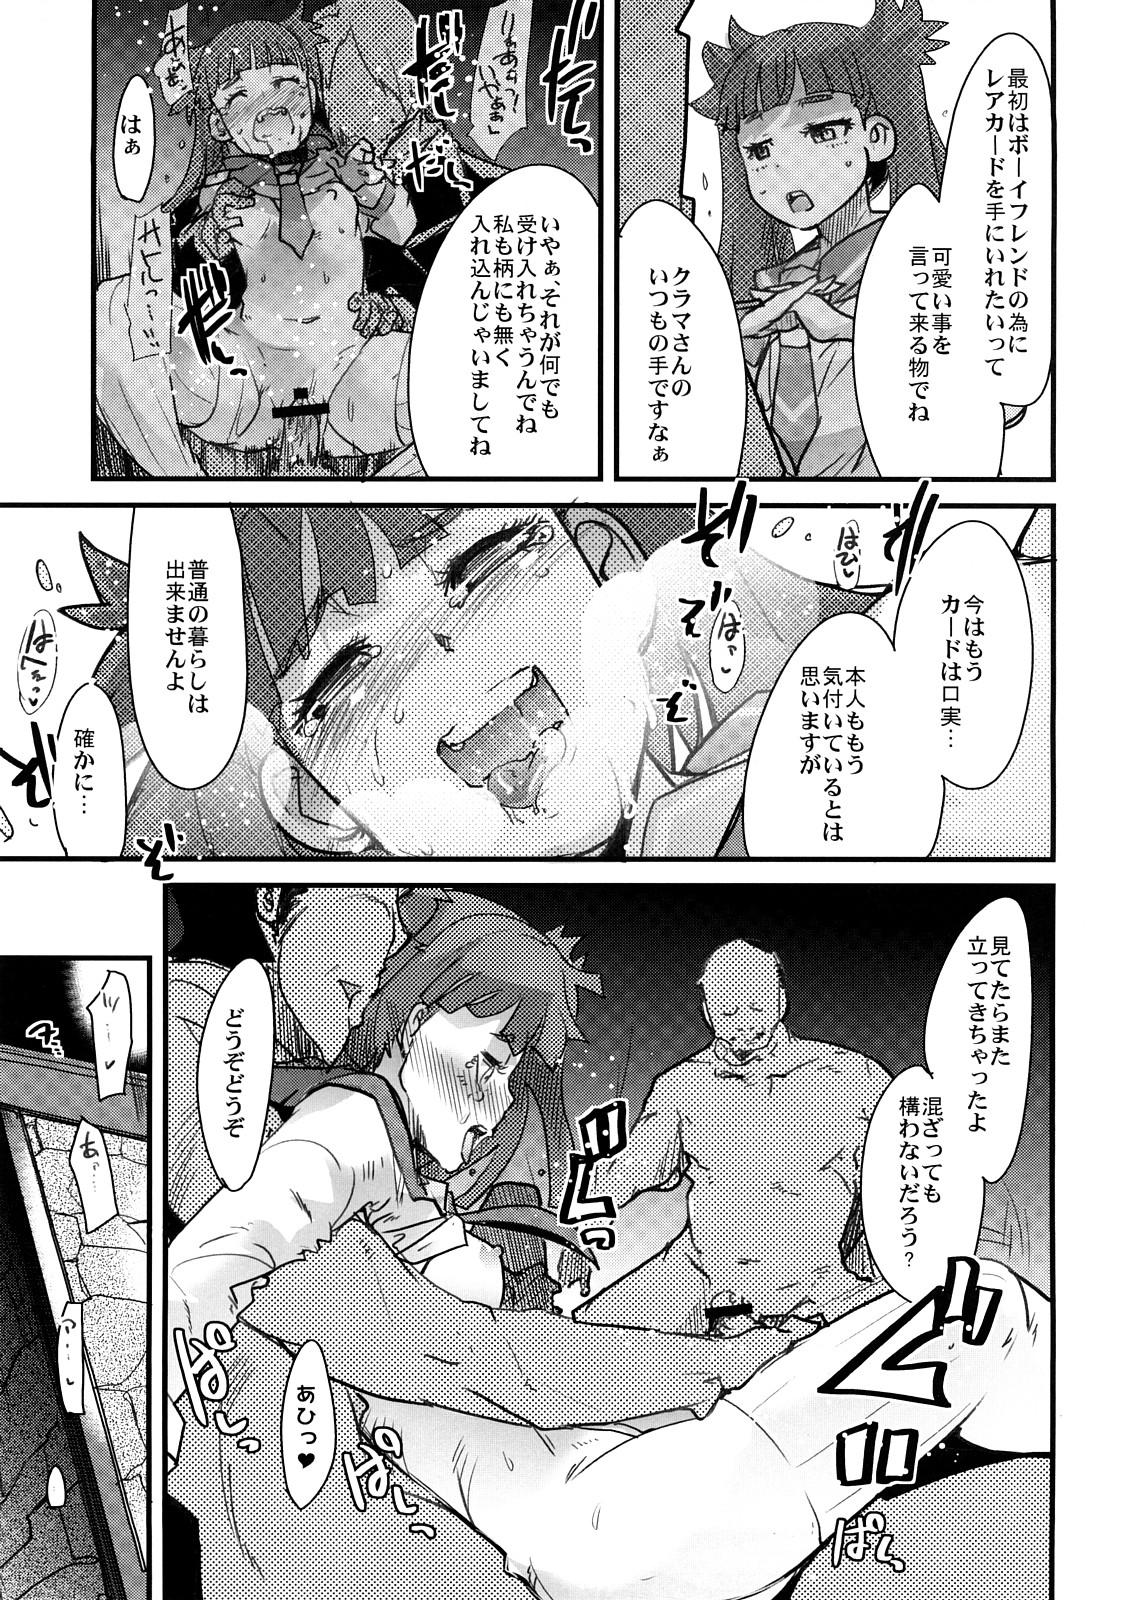 DS tte Omoshiroi Game ga Ookute Suteki 11